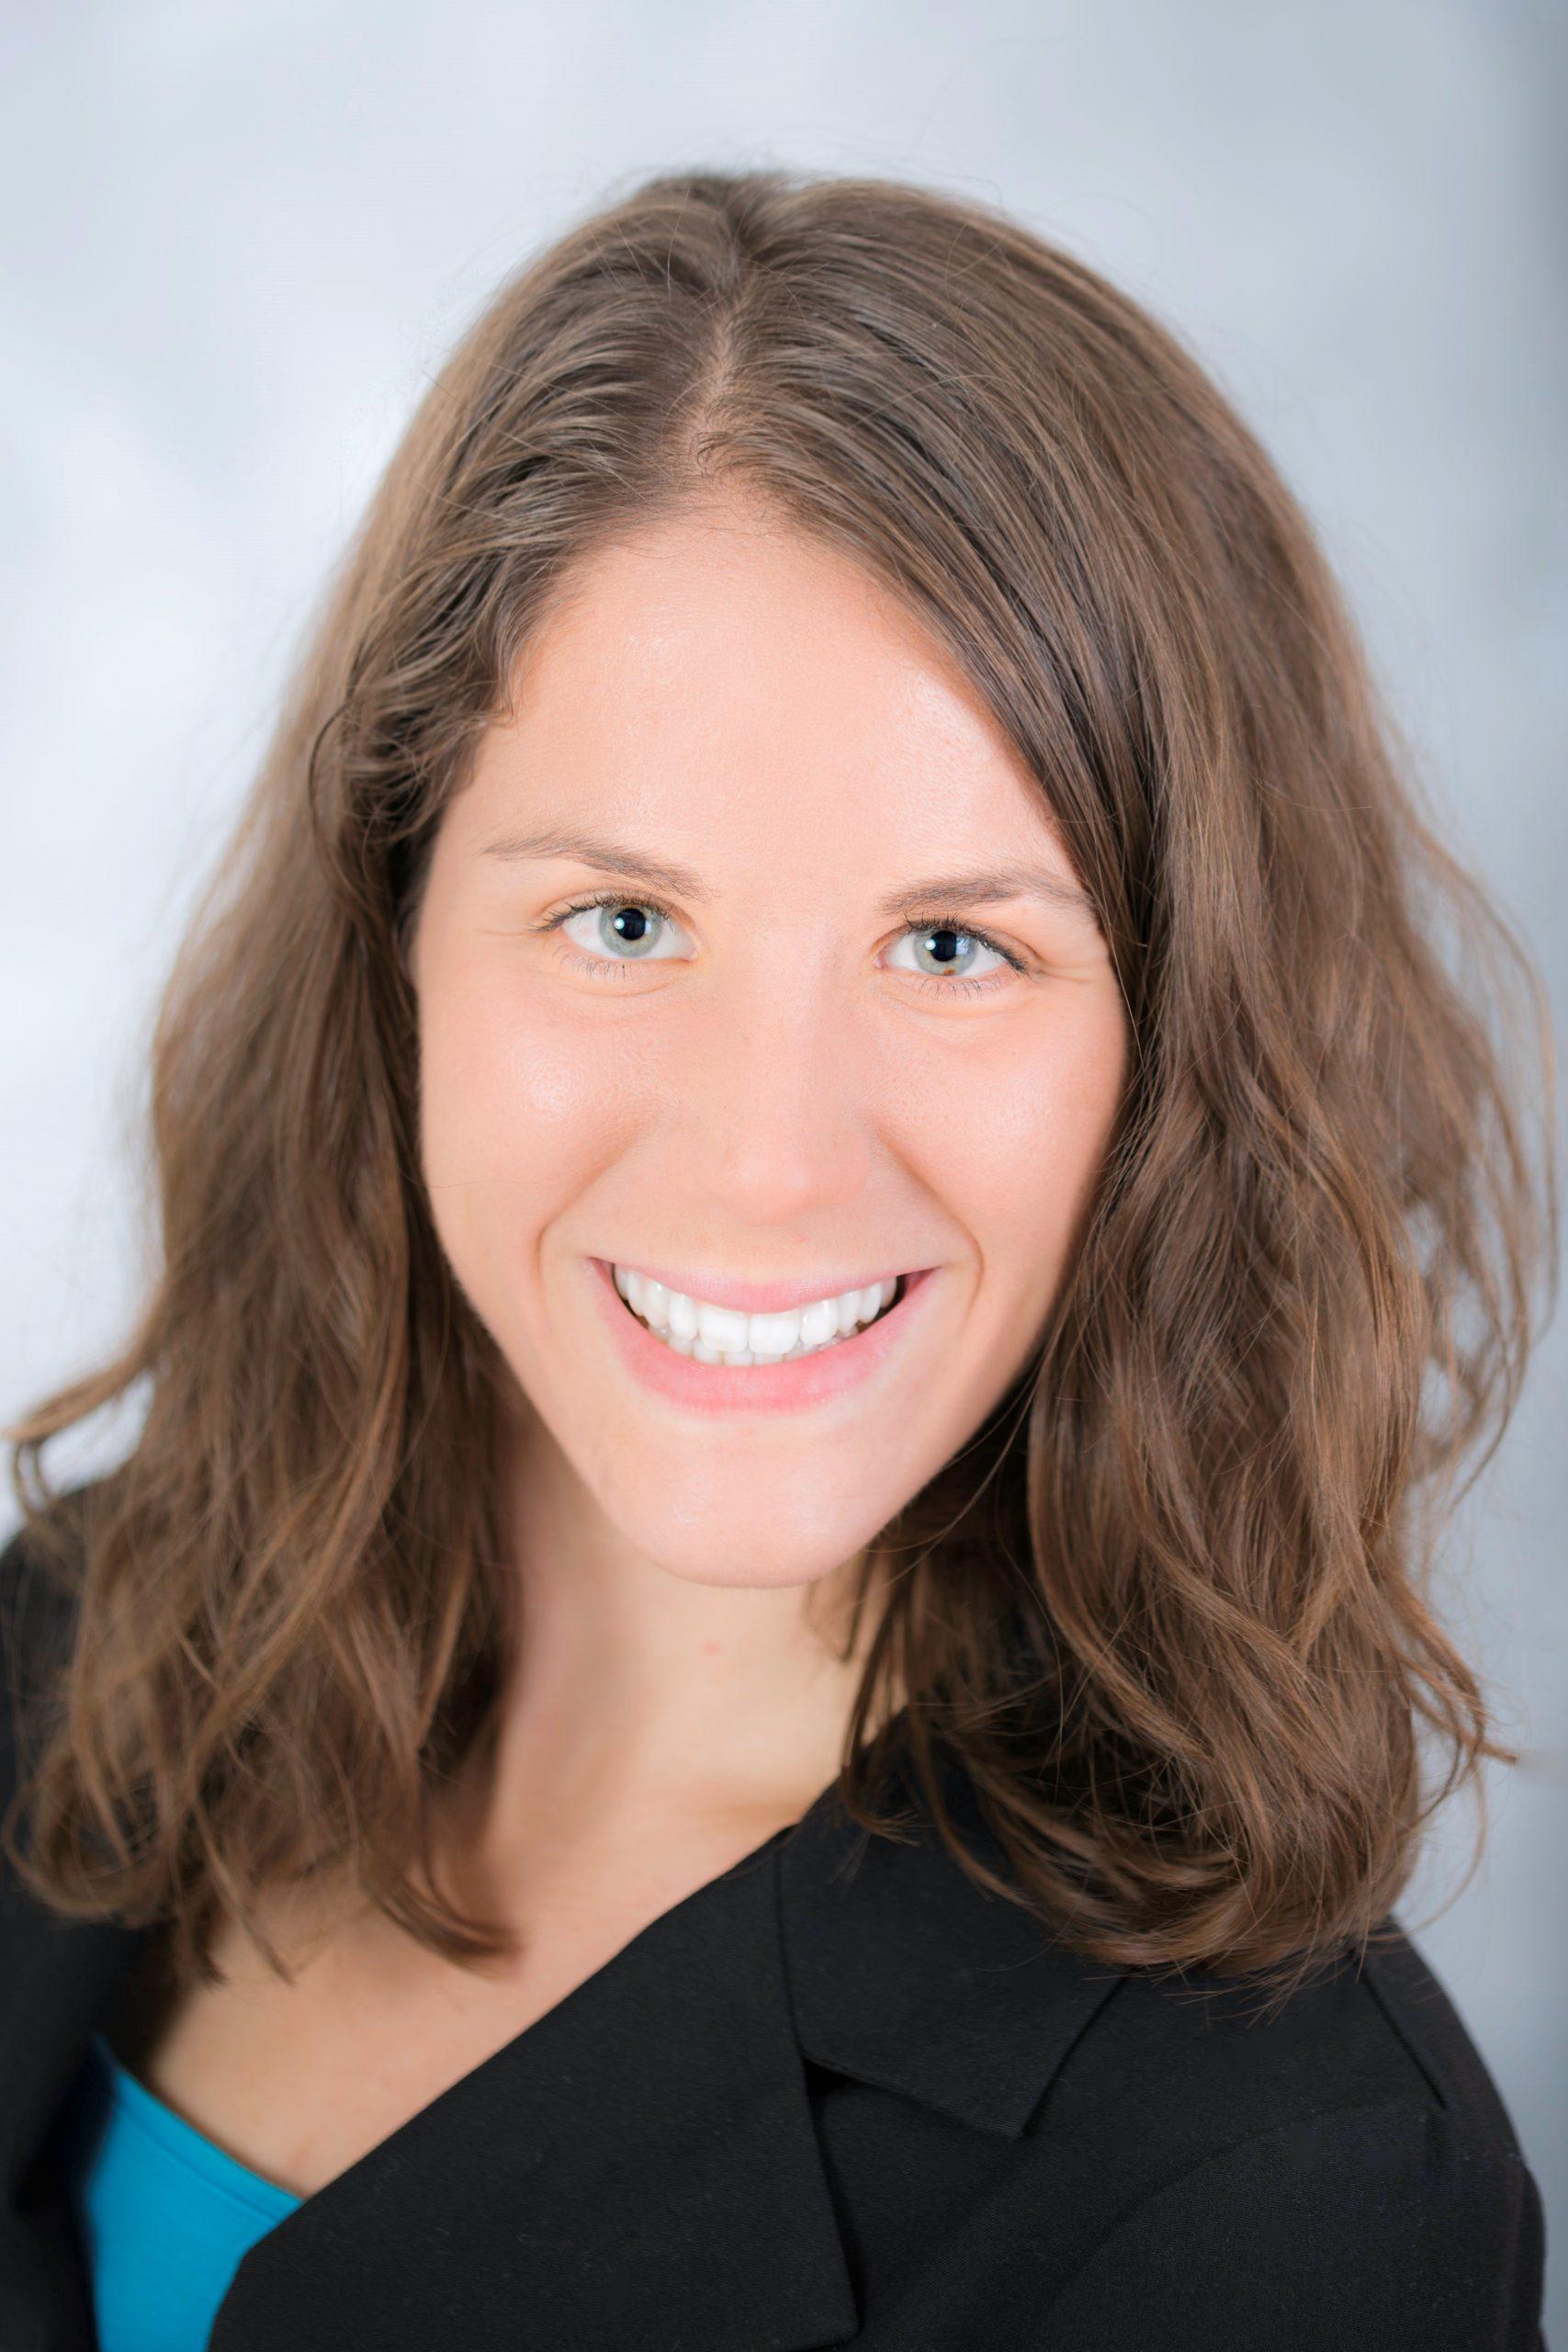 Headshot of Mary Wangen